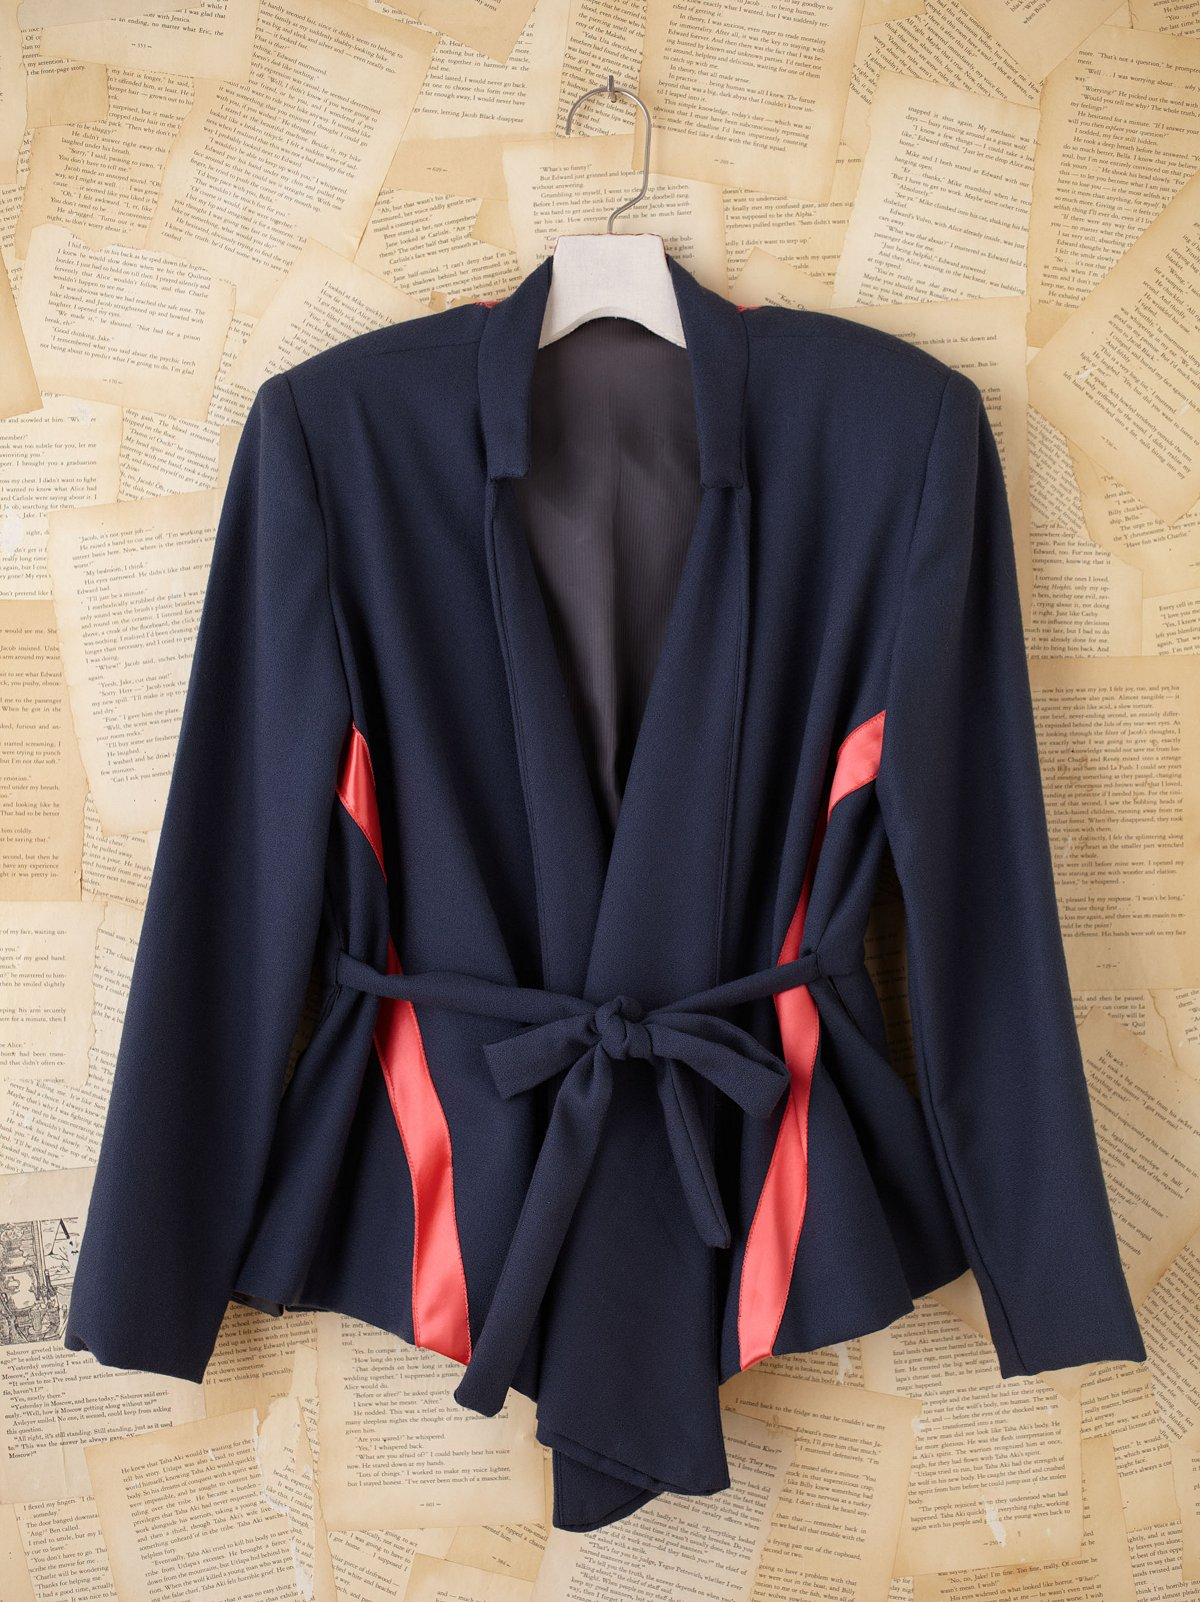 Vintage Tie Blazer